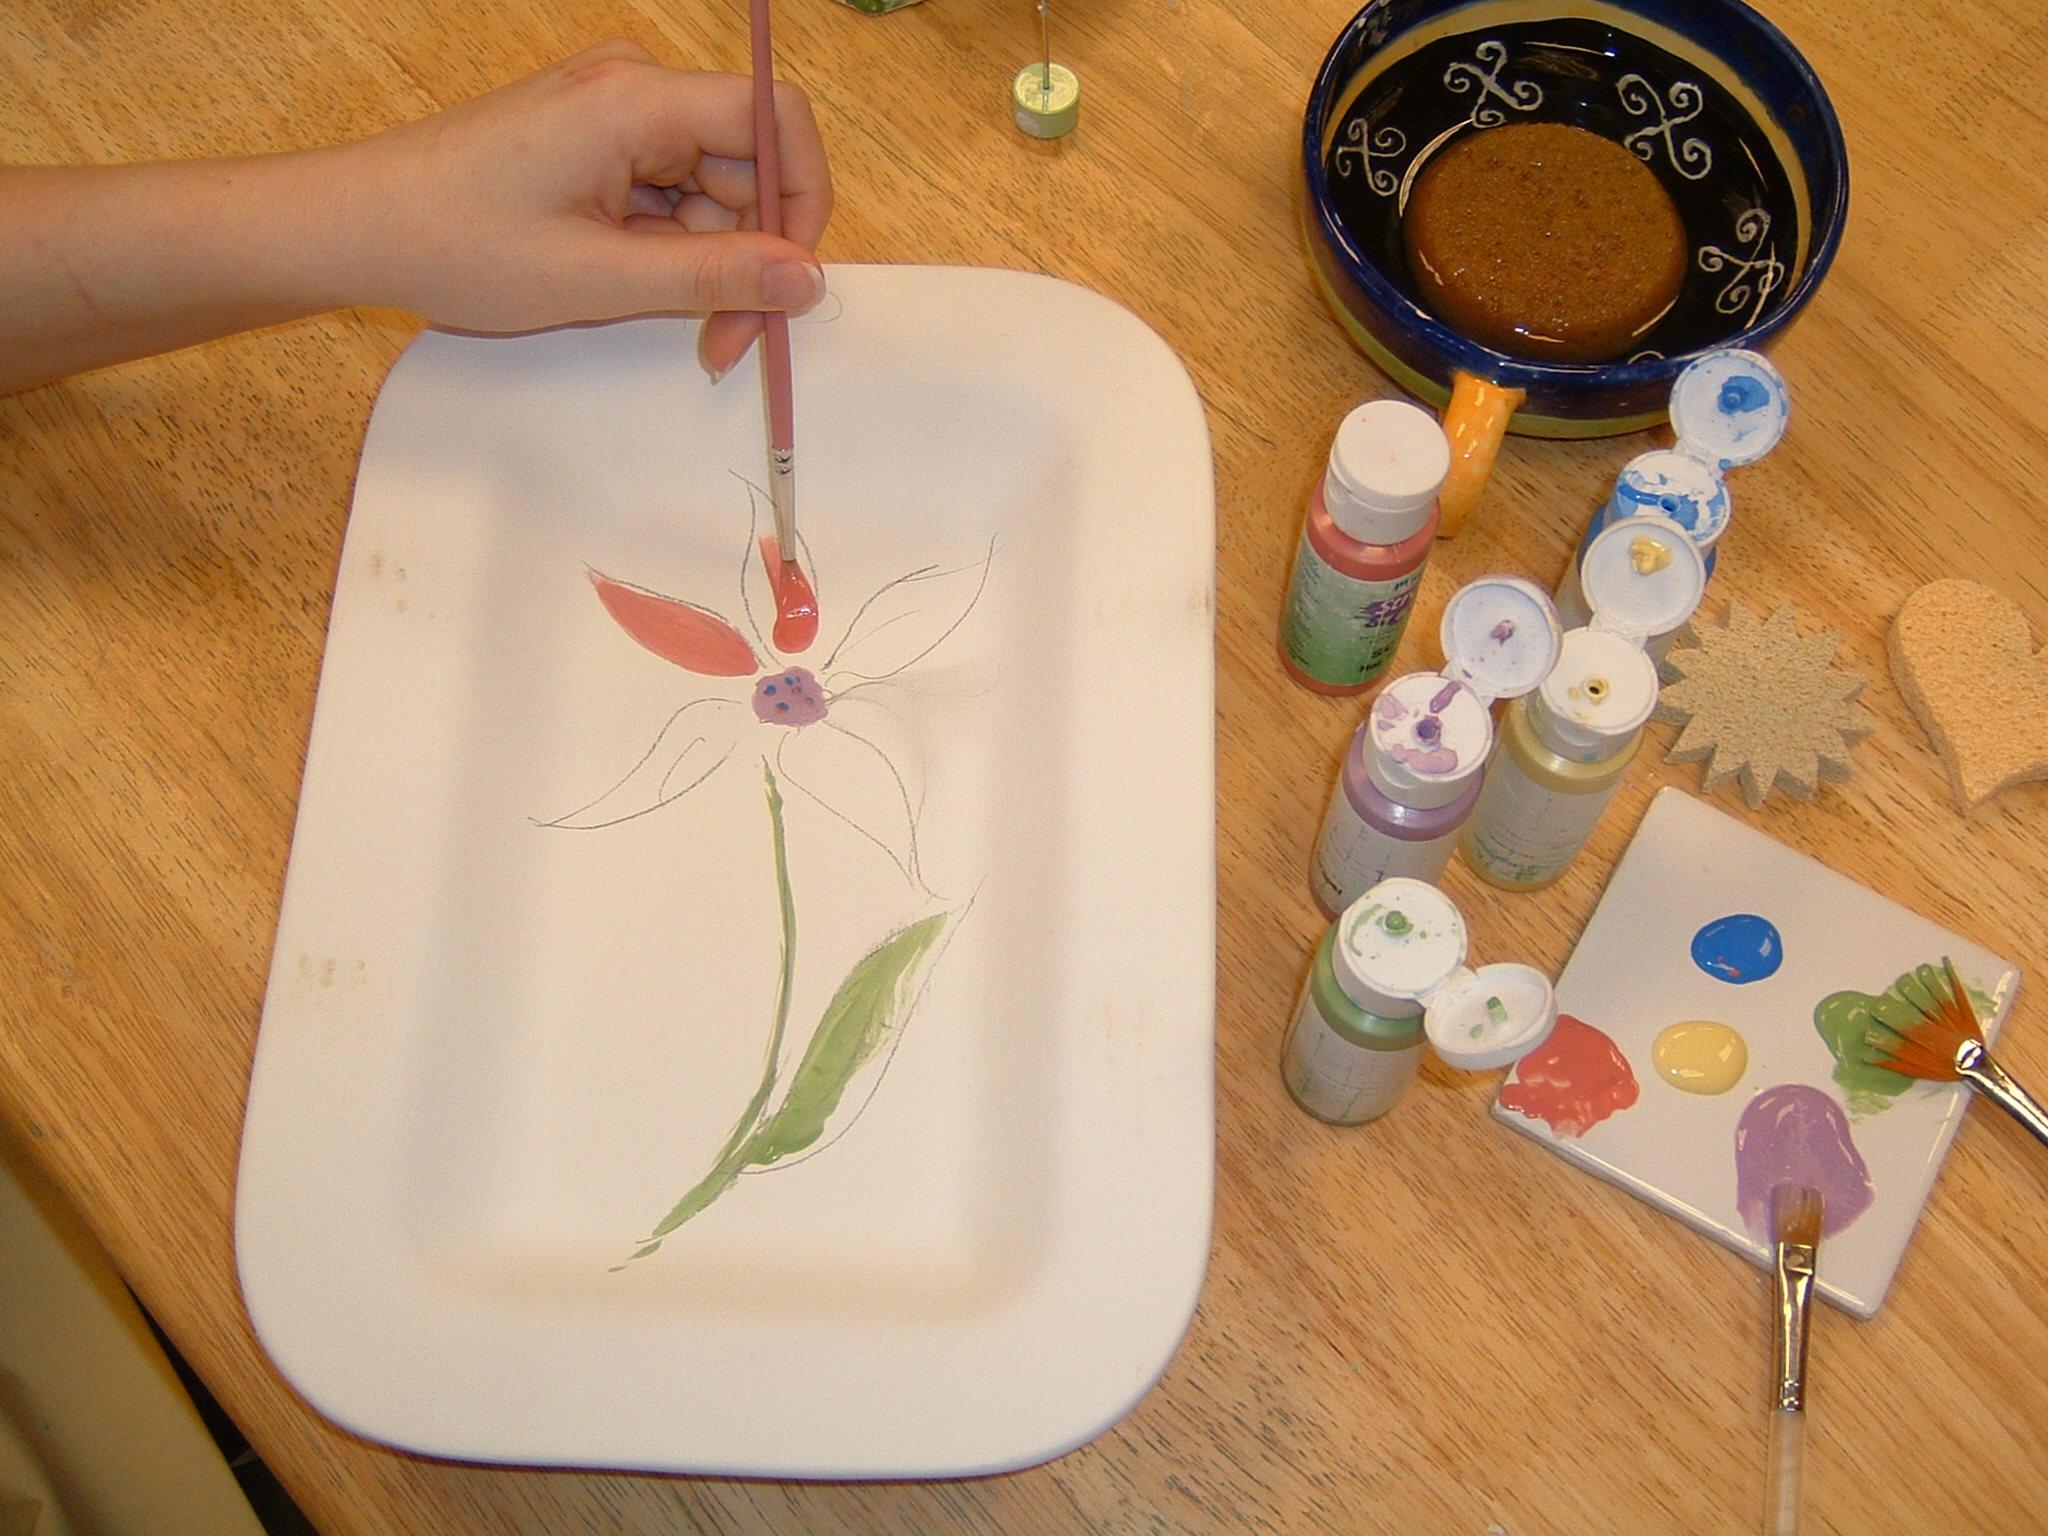 3. Paint away!